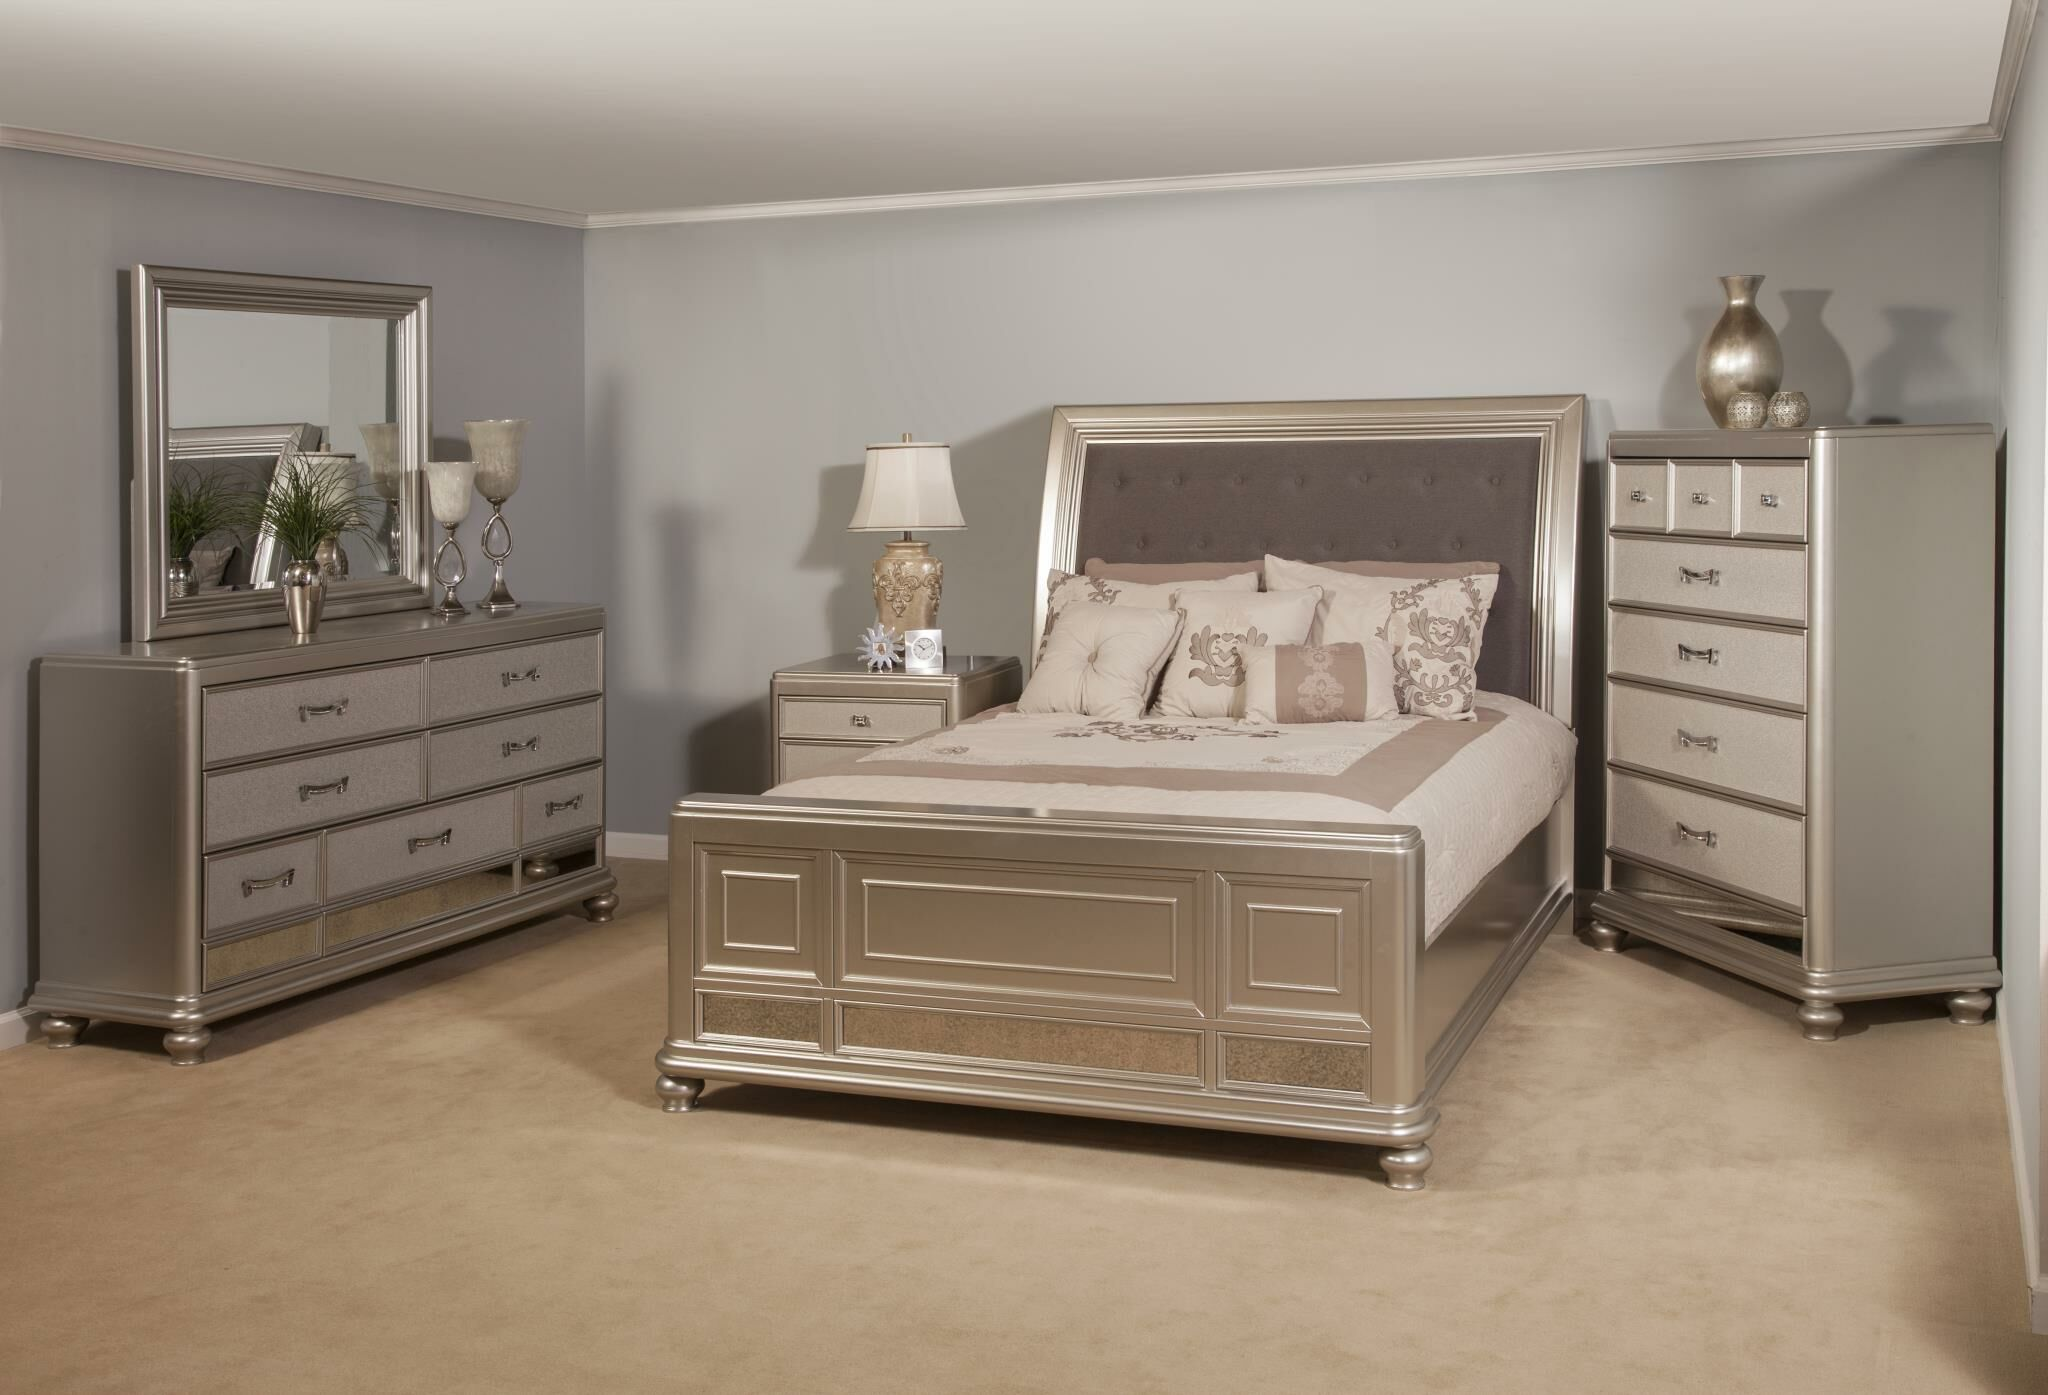 Kilburn Sleigh 6 Piece Bedroom Set Bed Size: King